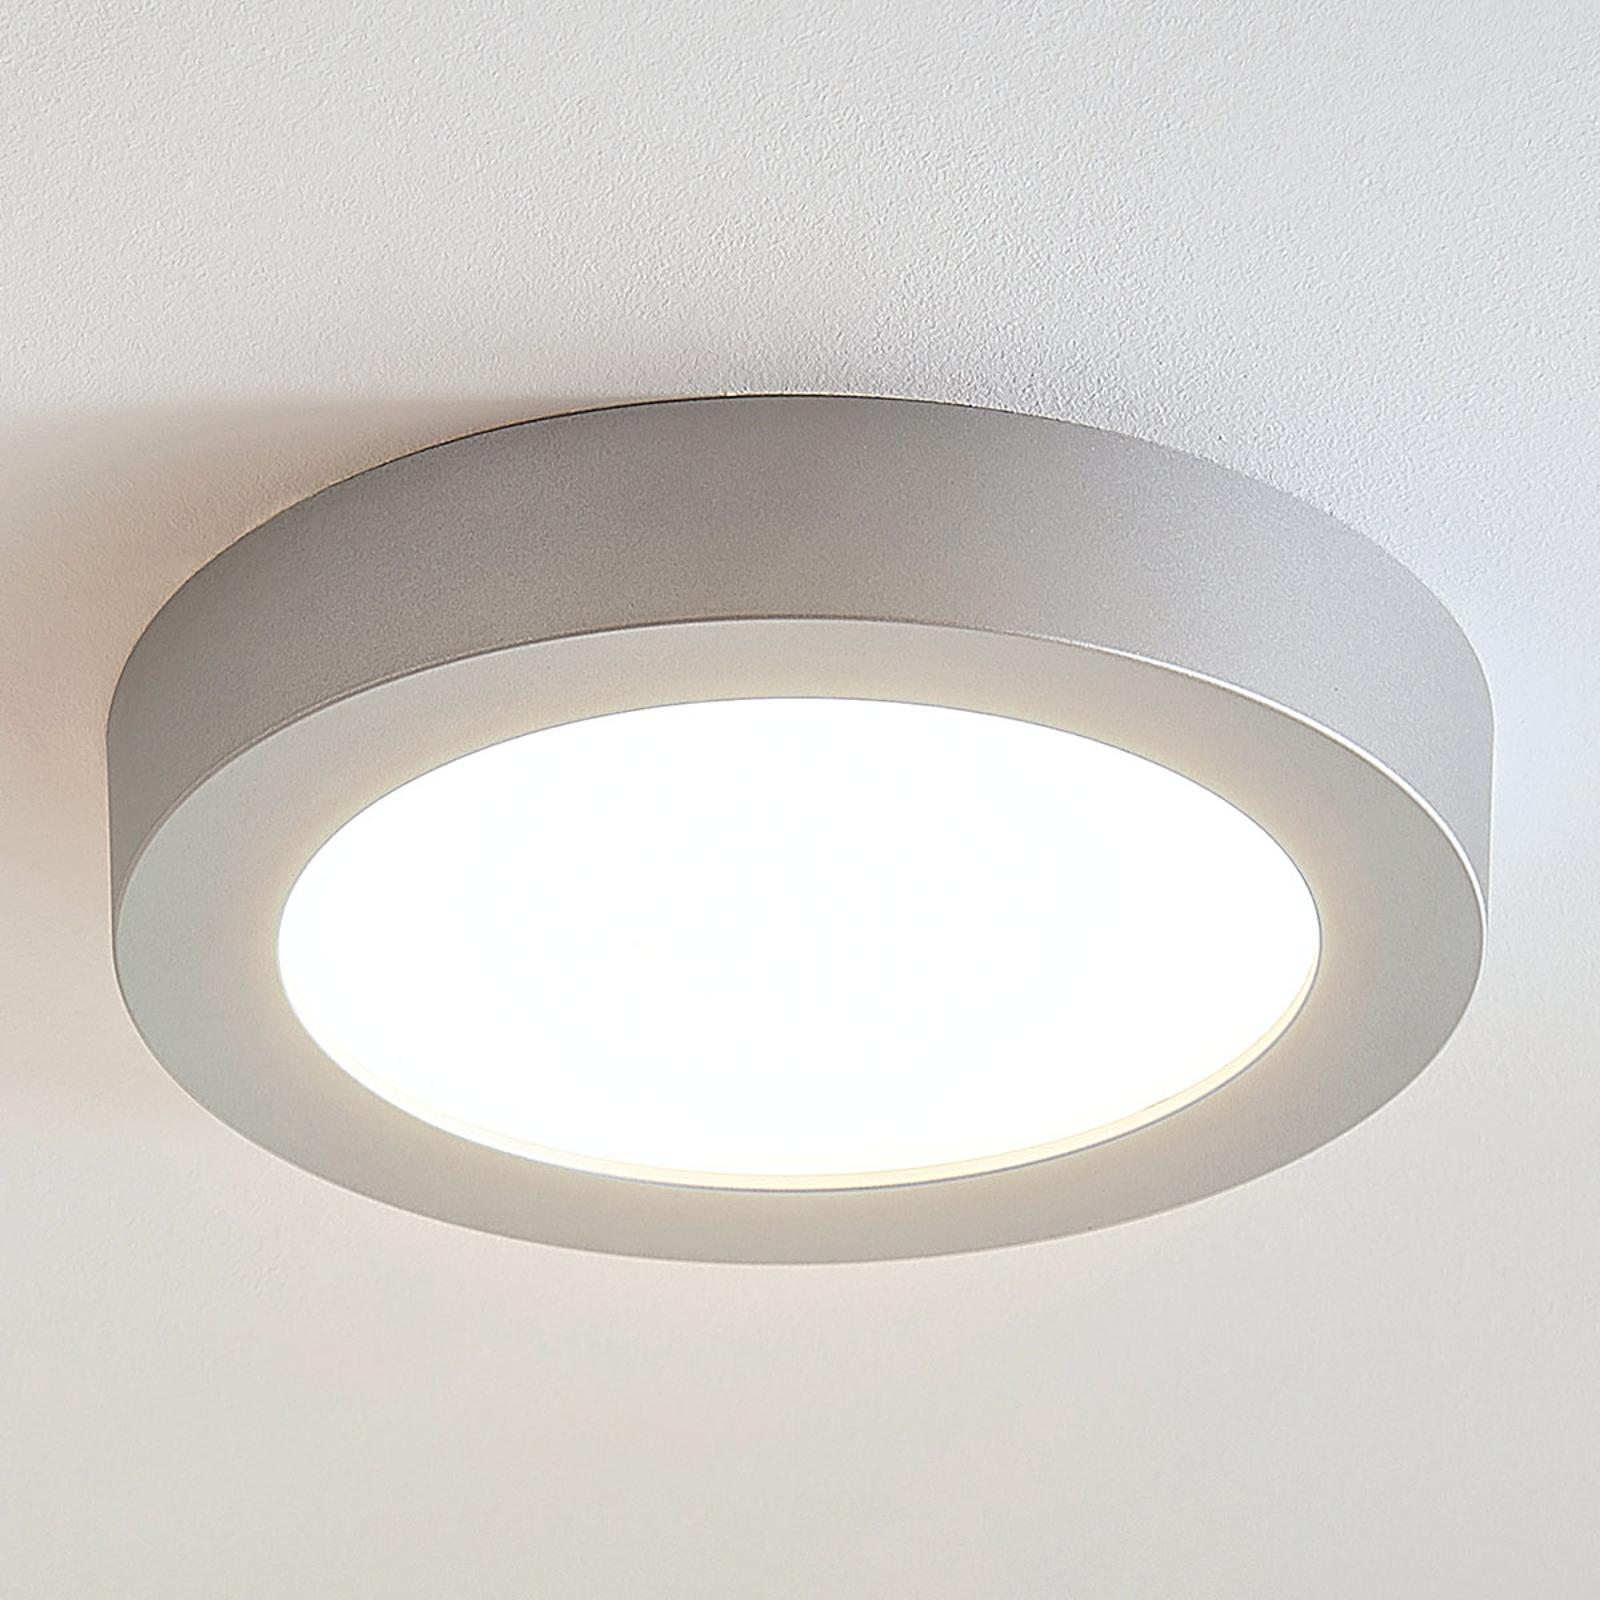 Marlo LED-loftlampe sølv 3000K rund 25,2cm